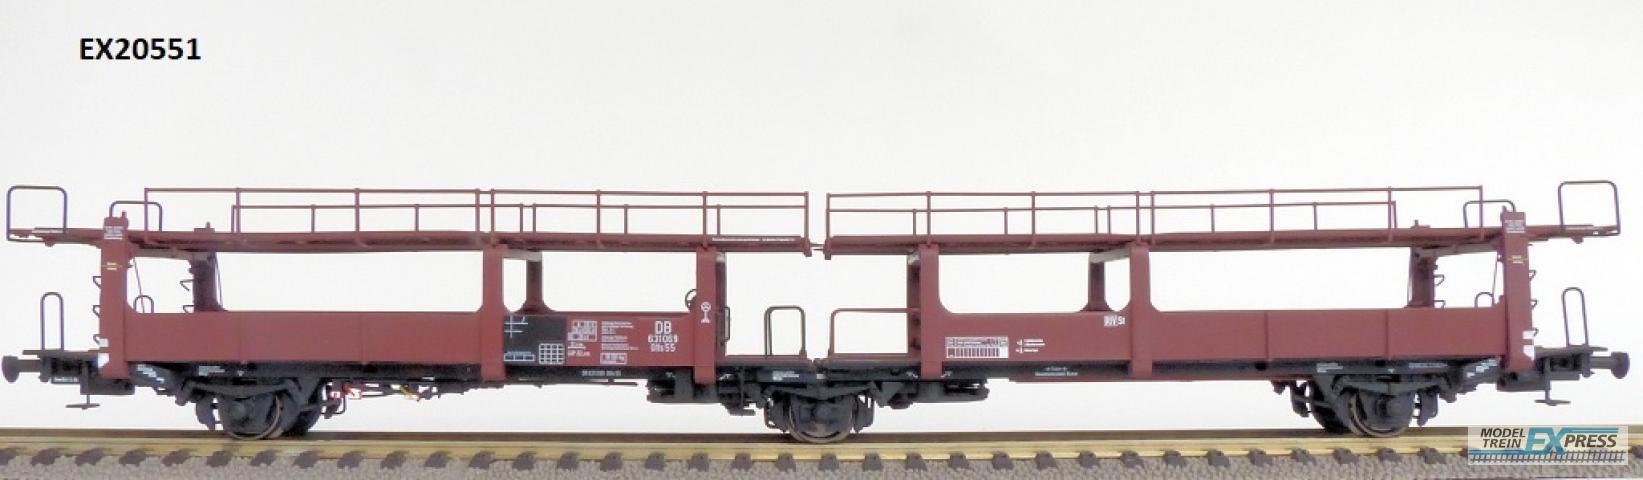 Exact-train 20551